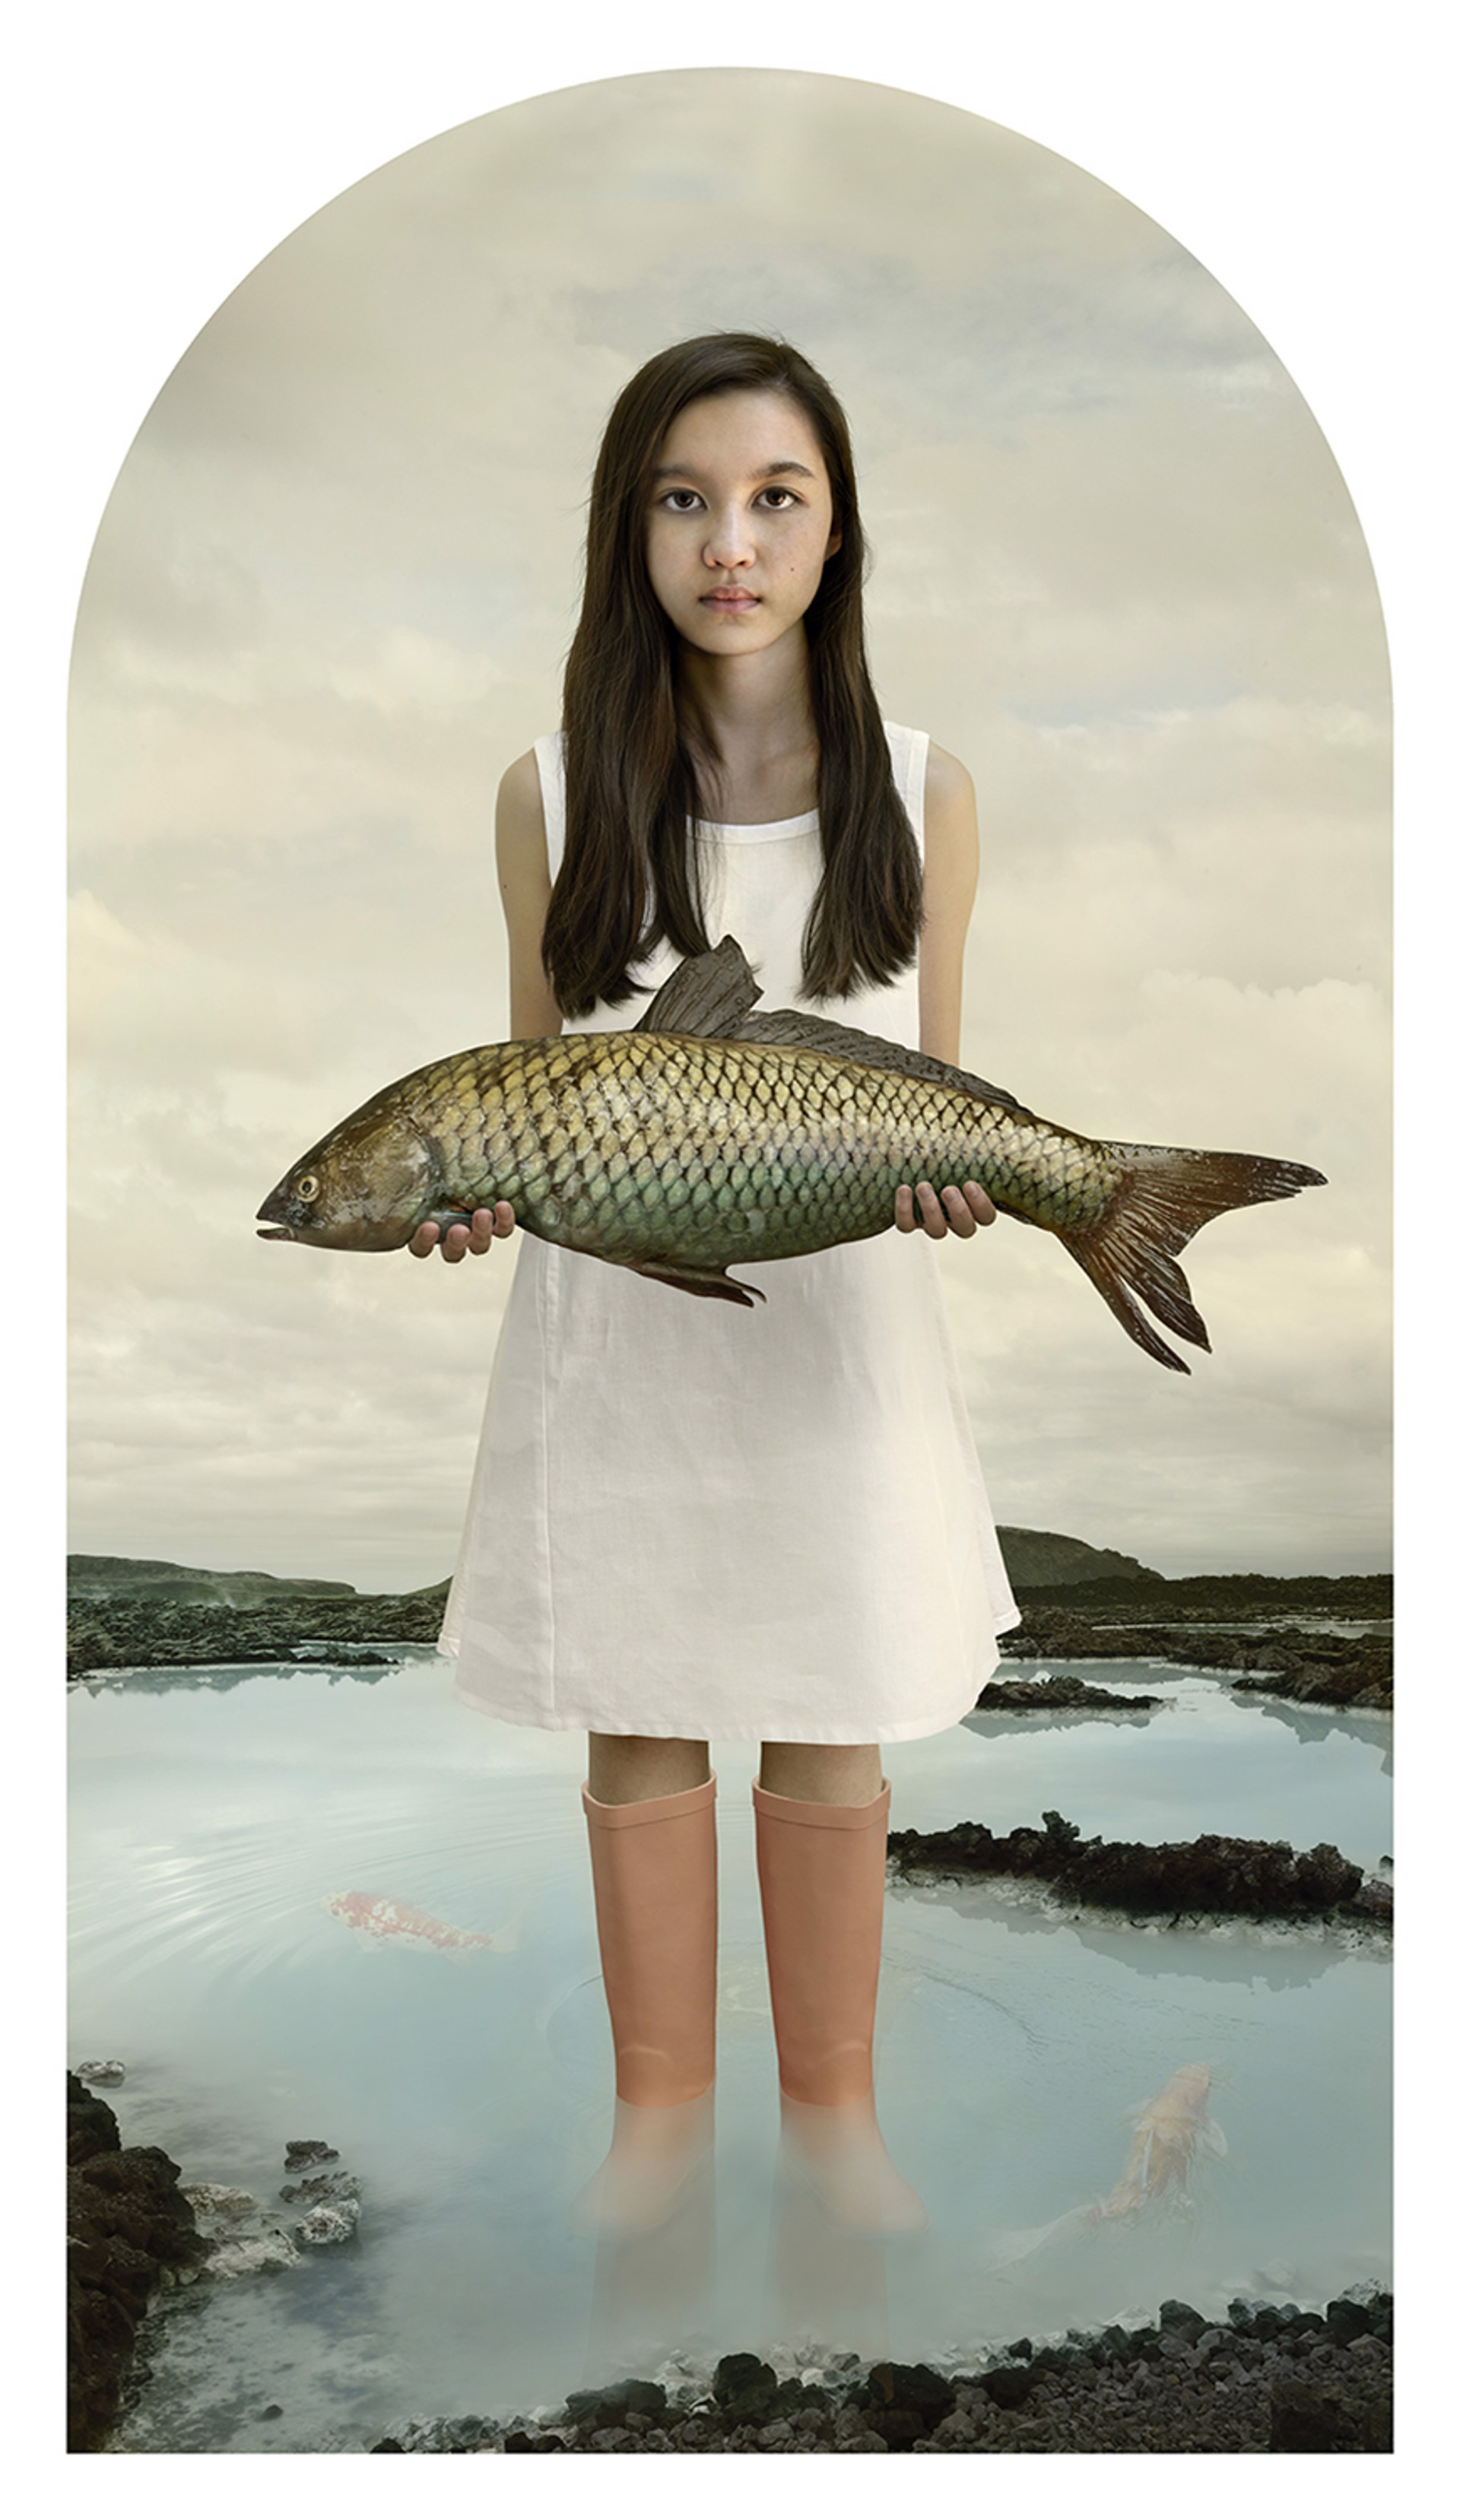 Strange Waters by Tom Chambers